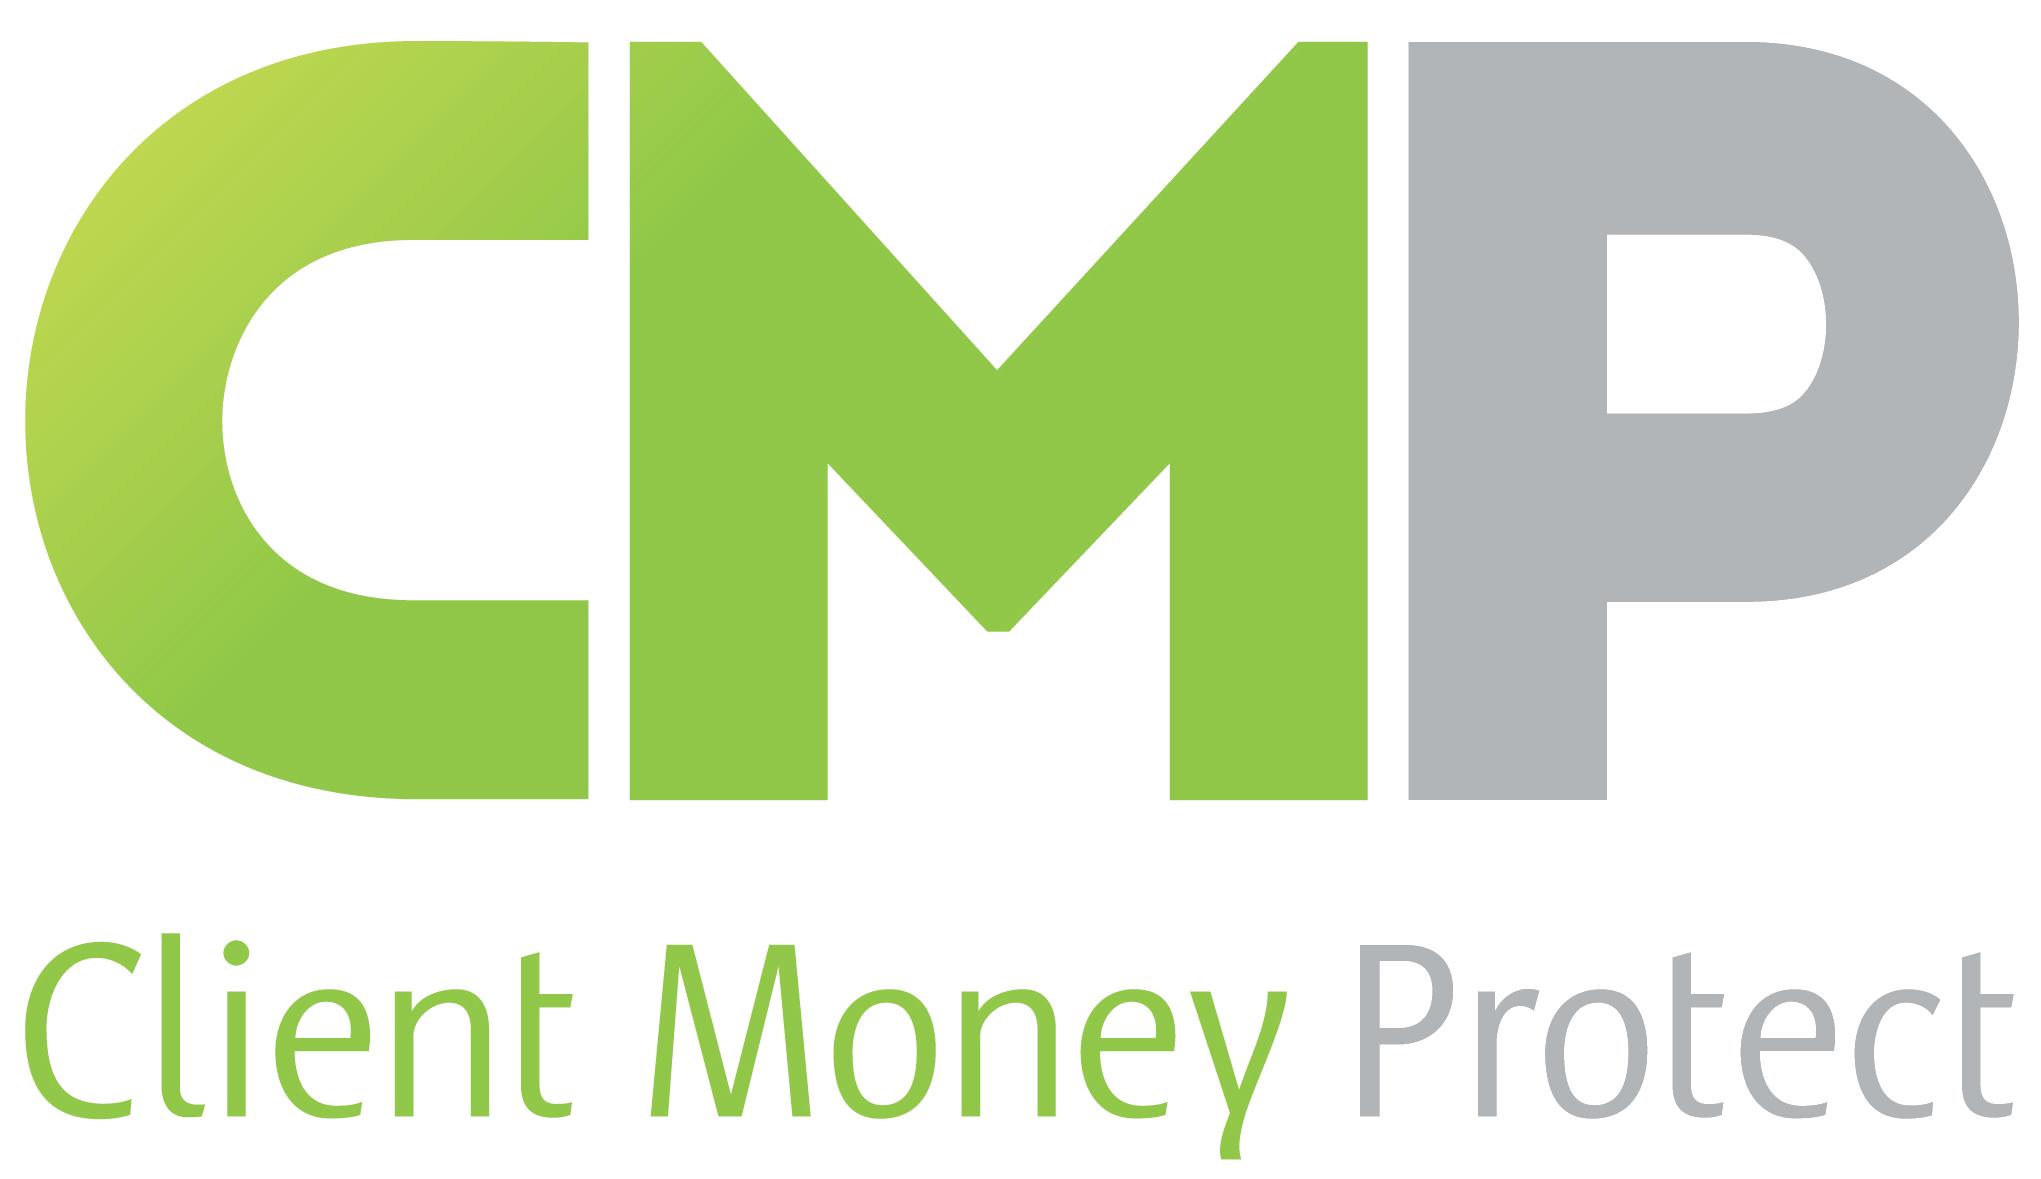 Client Money Protect Logo